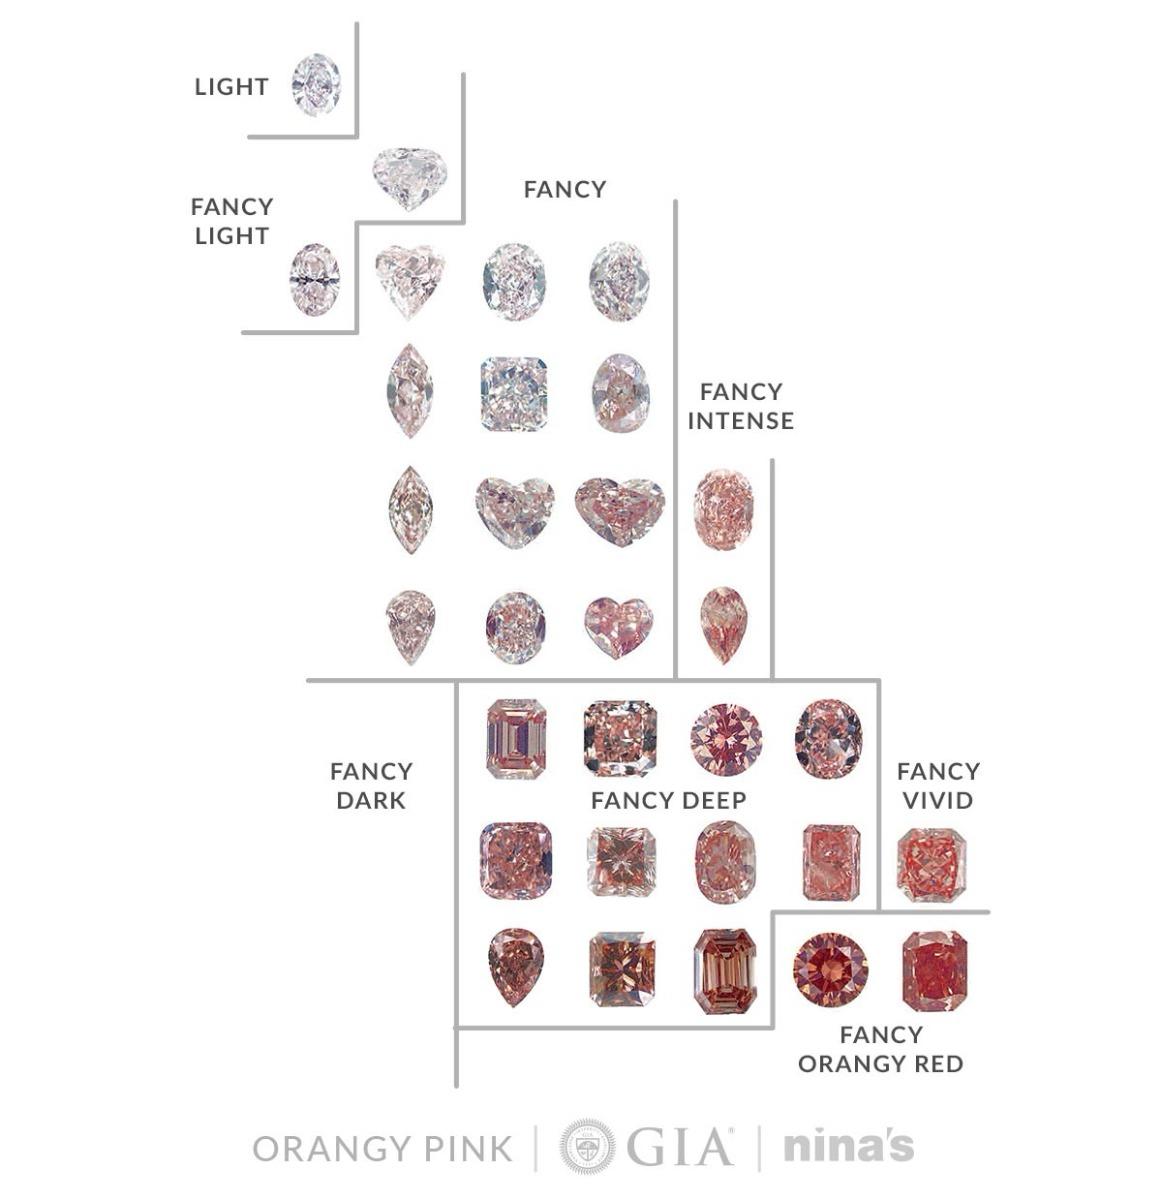 GIAchart-orangy pink